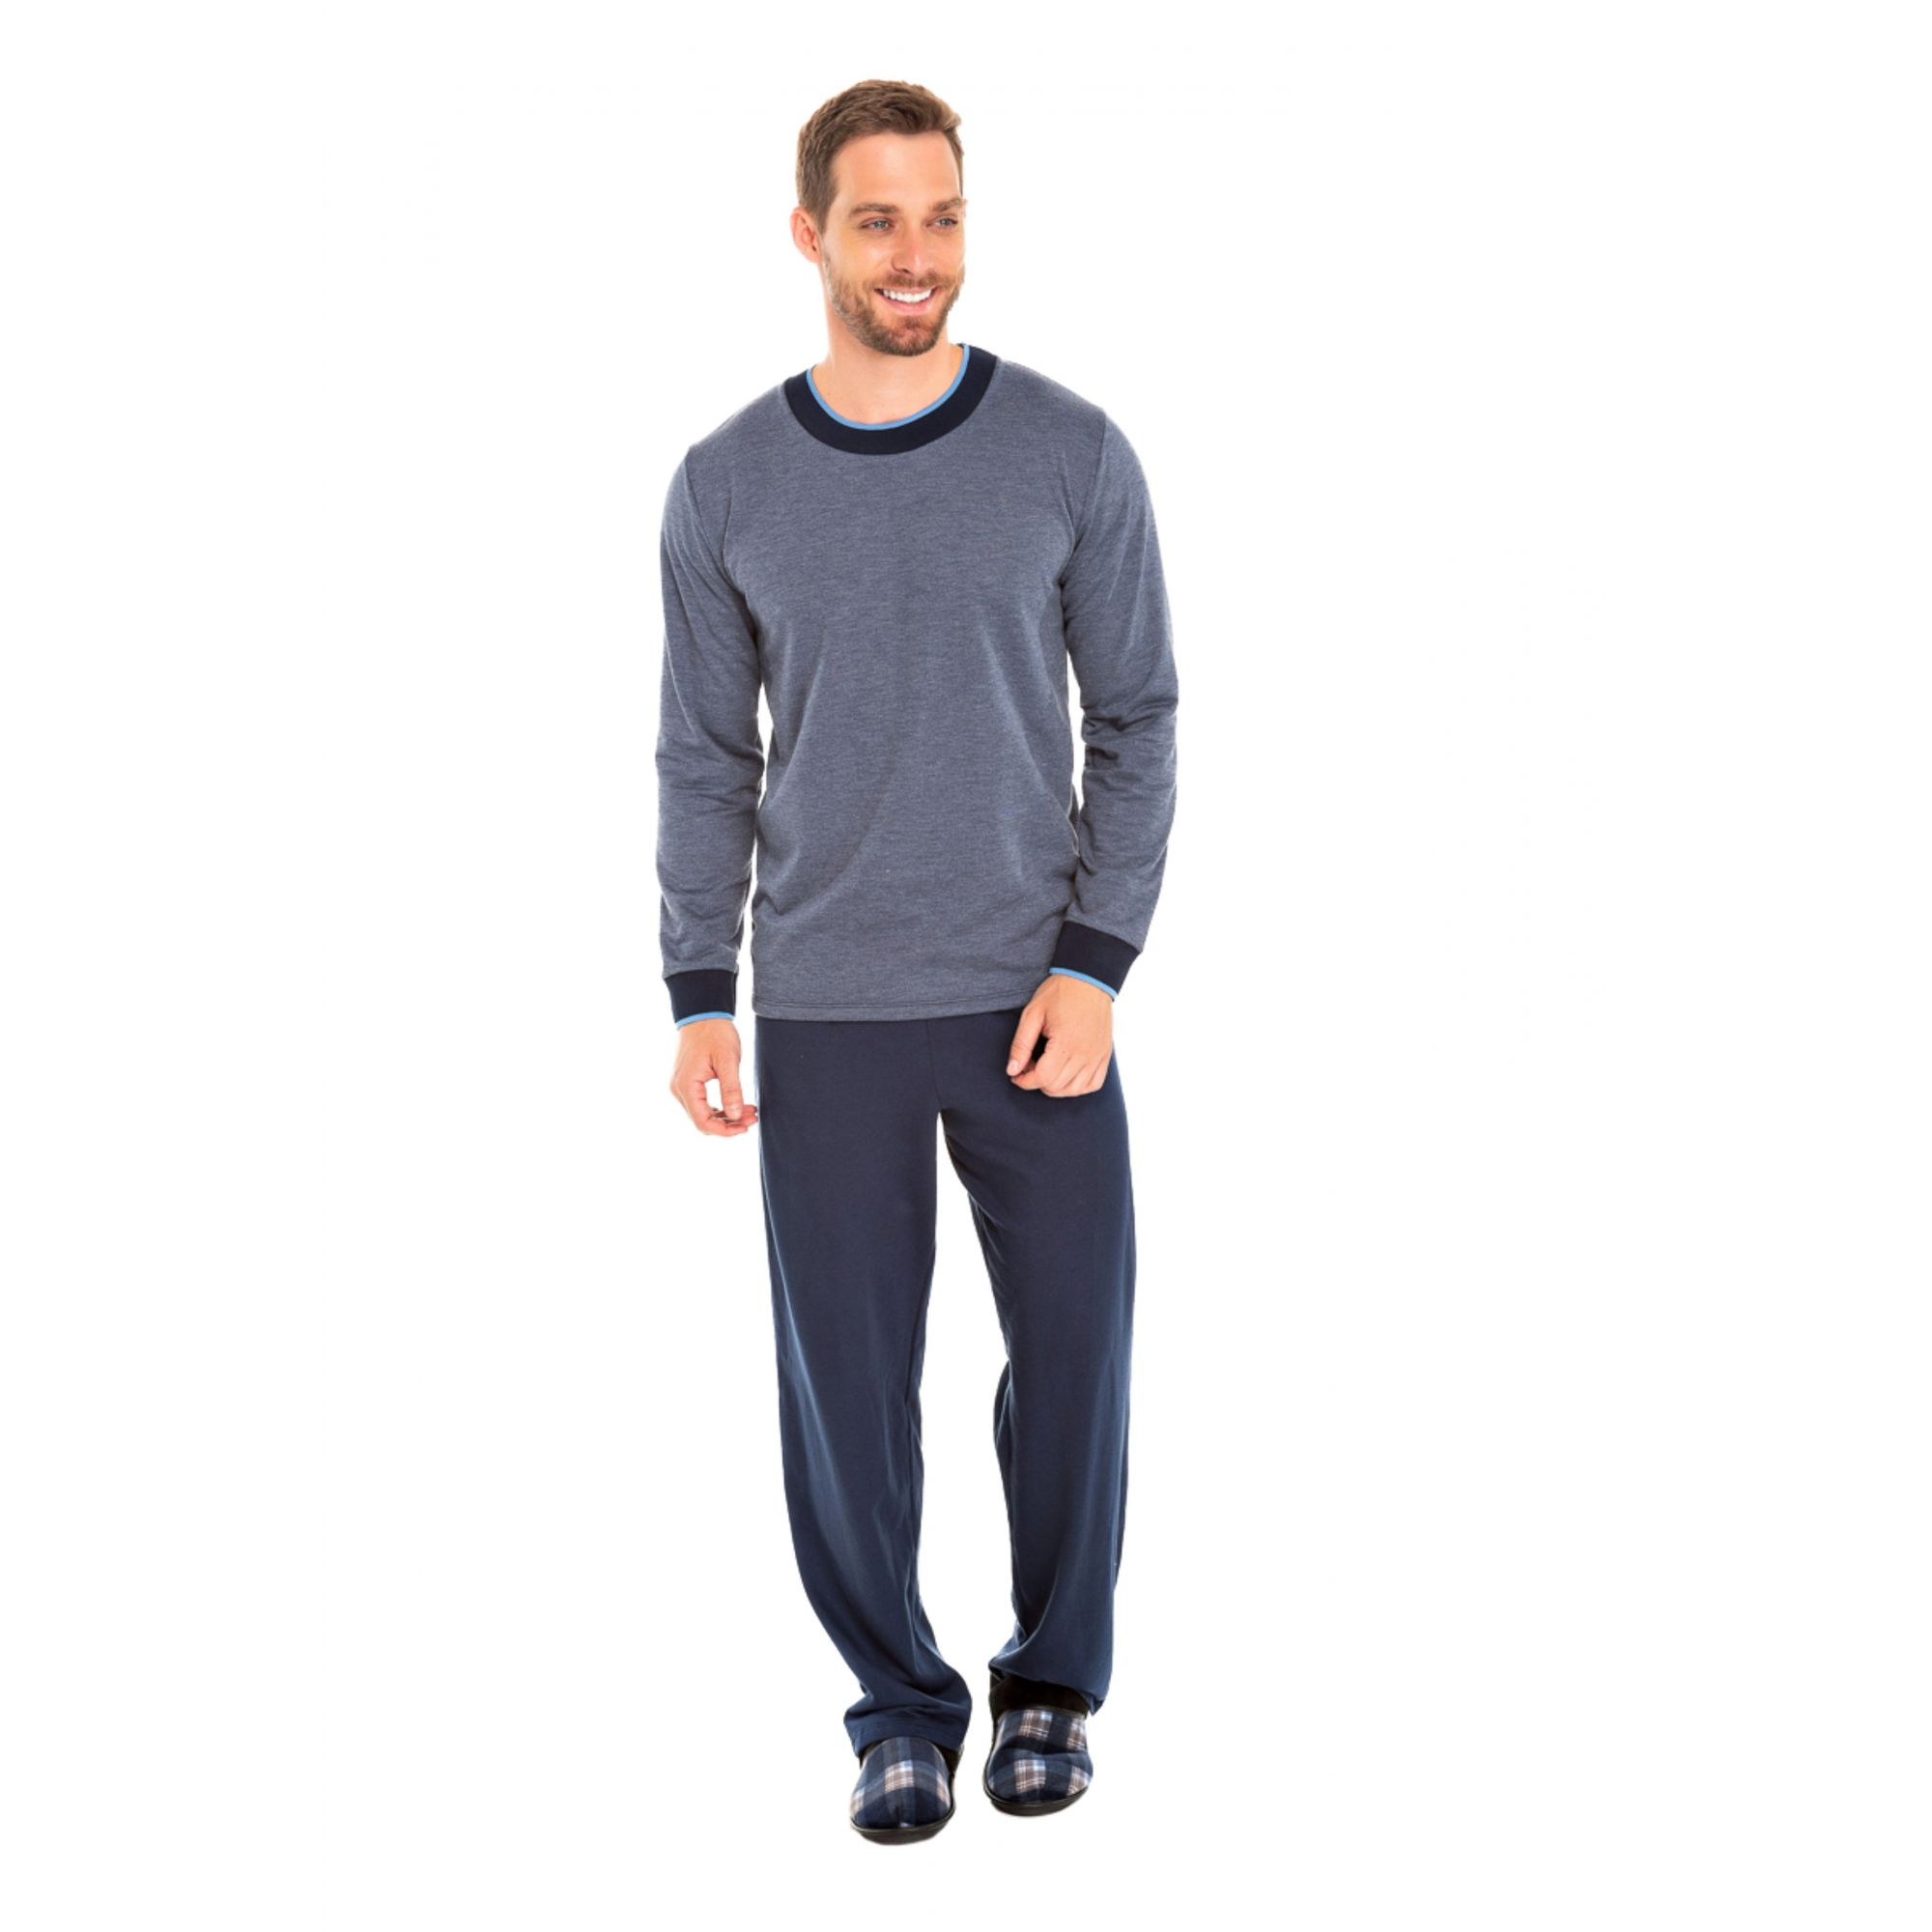 005/E - Pijama Adulto Masculino Moletinho